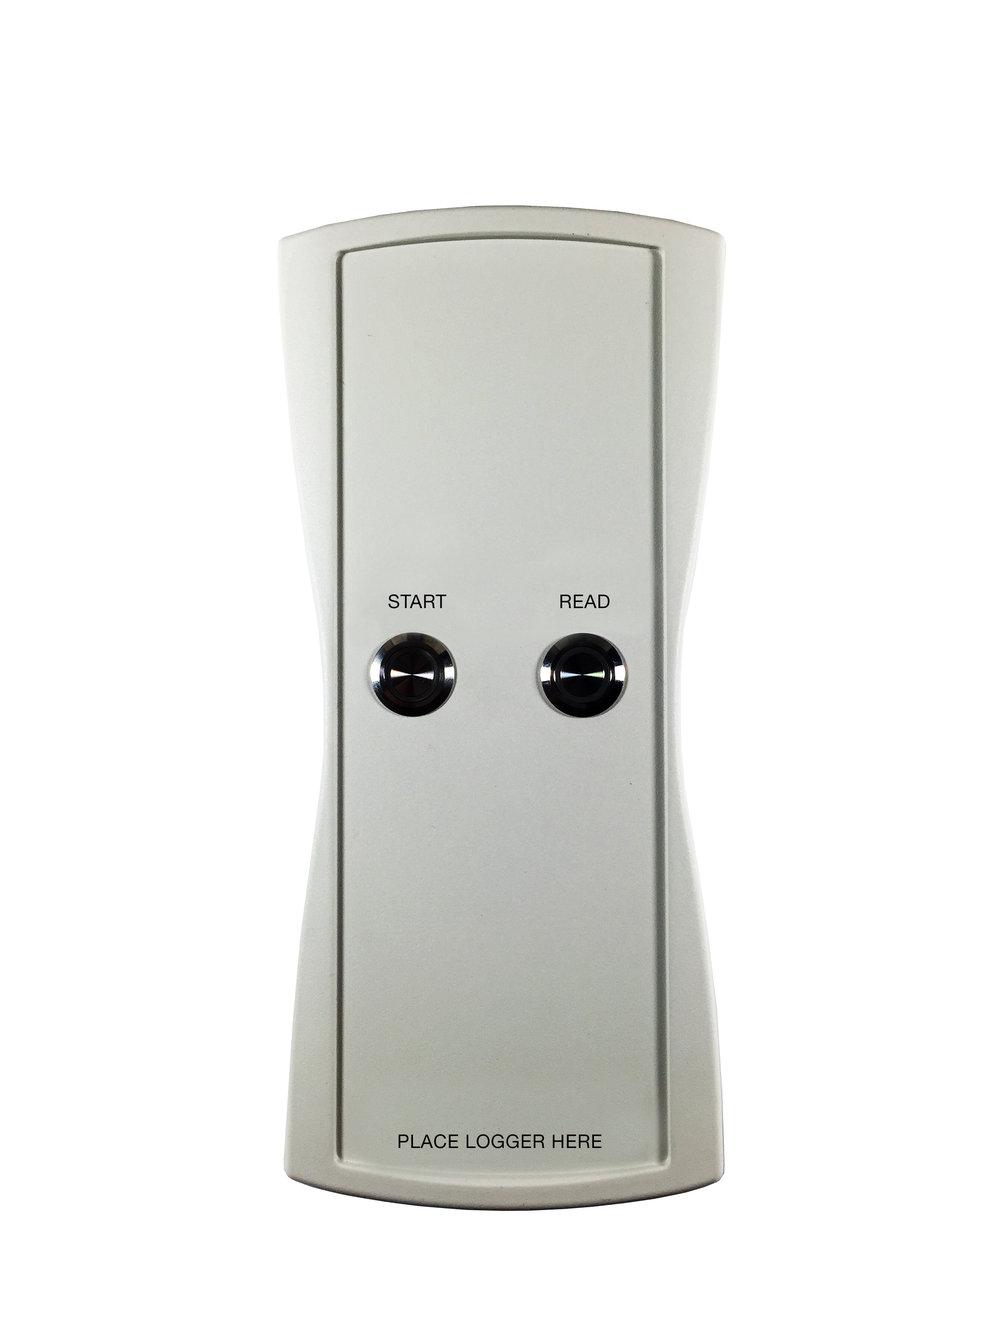 Wireless Sensor Reader (SENSOCO + OEM)